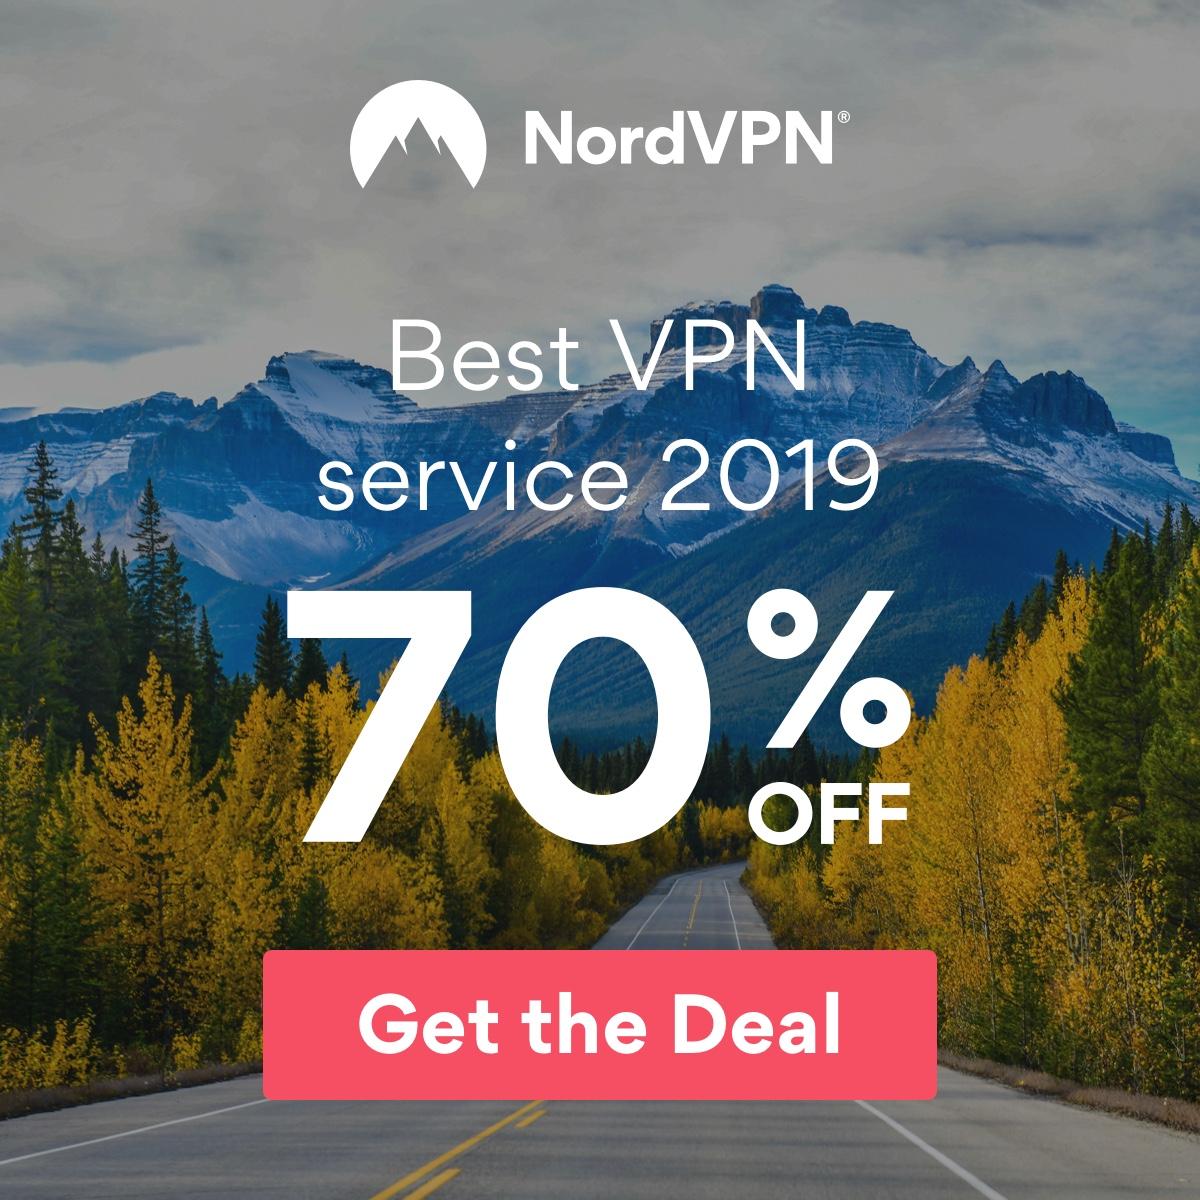 nordvpn-349-1200x1200-best-service-EN.jpg